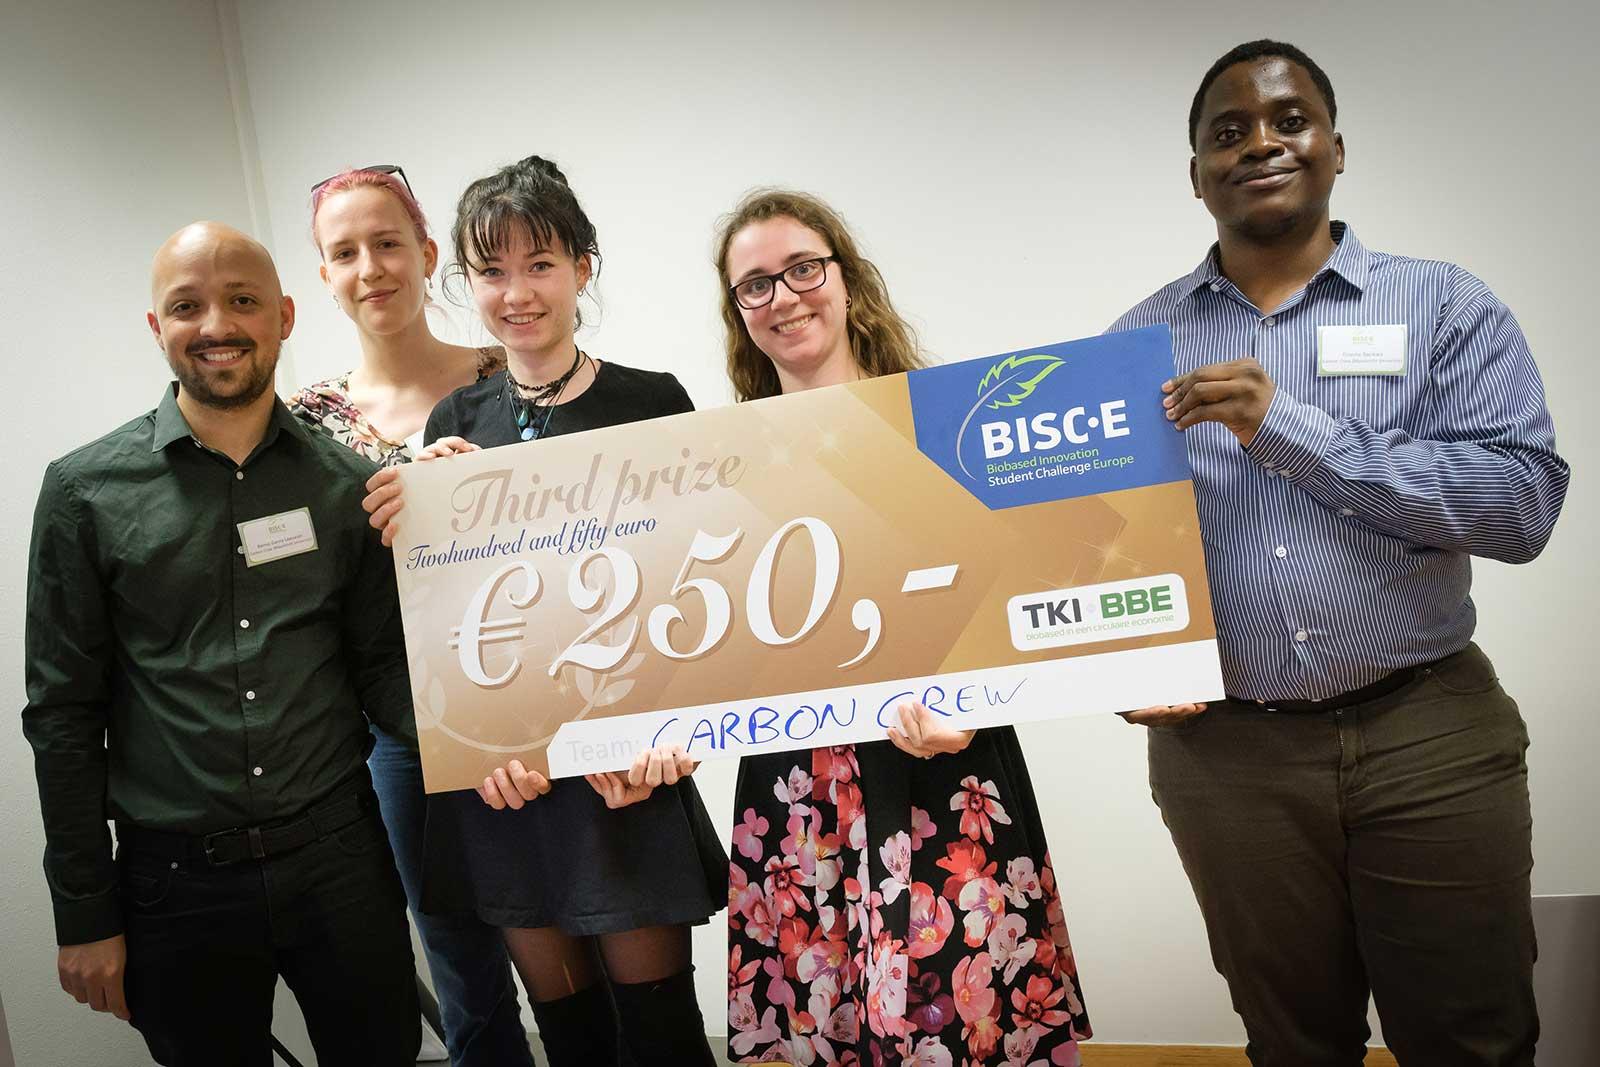 Team Carbon Crew (UM) derde prijs BISC-E NL 2019